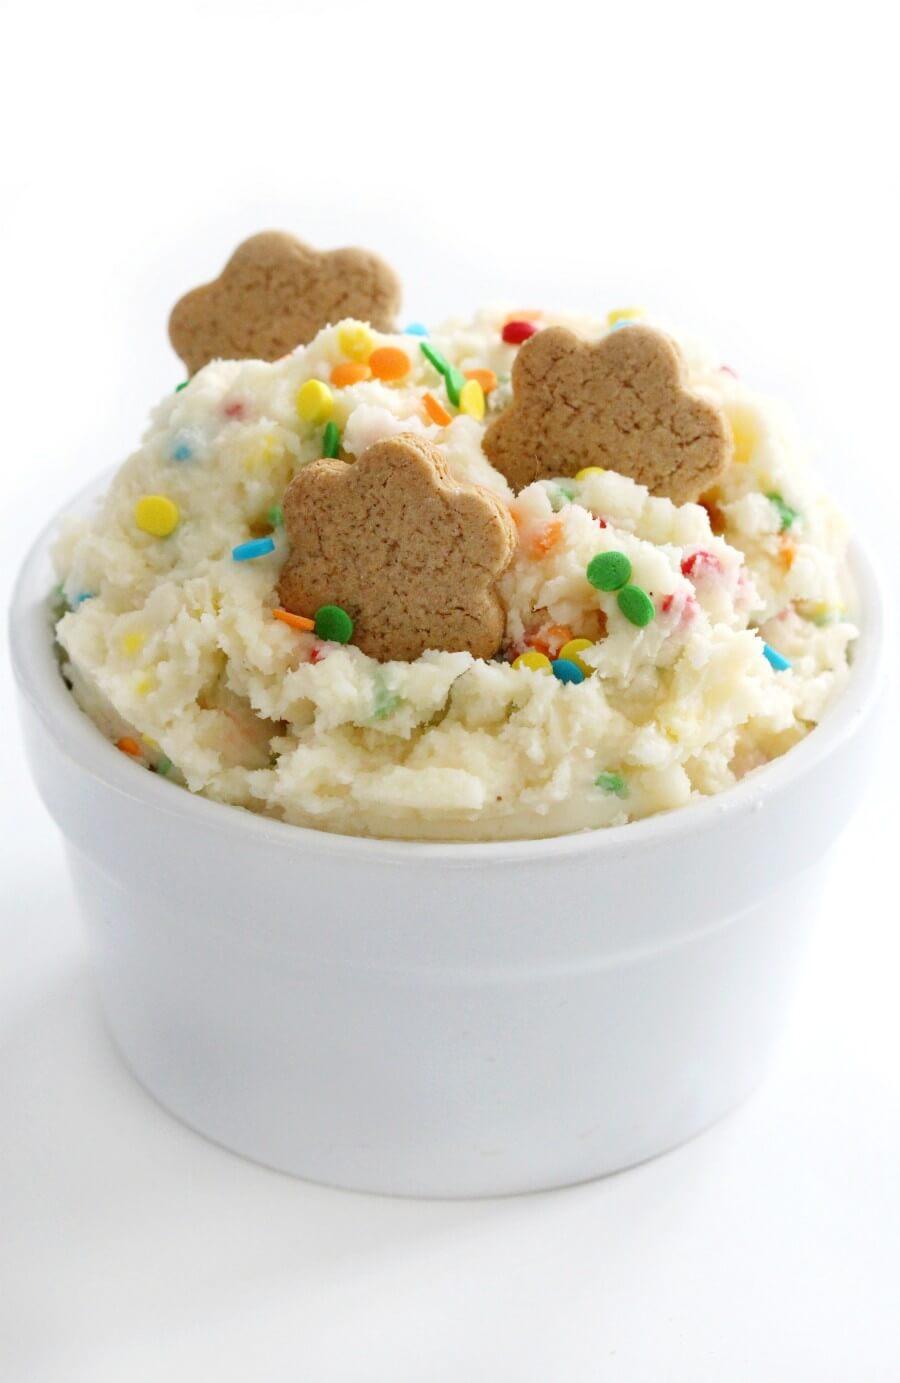 gluten-free dunkaroo cookies in frosting bowl